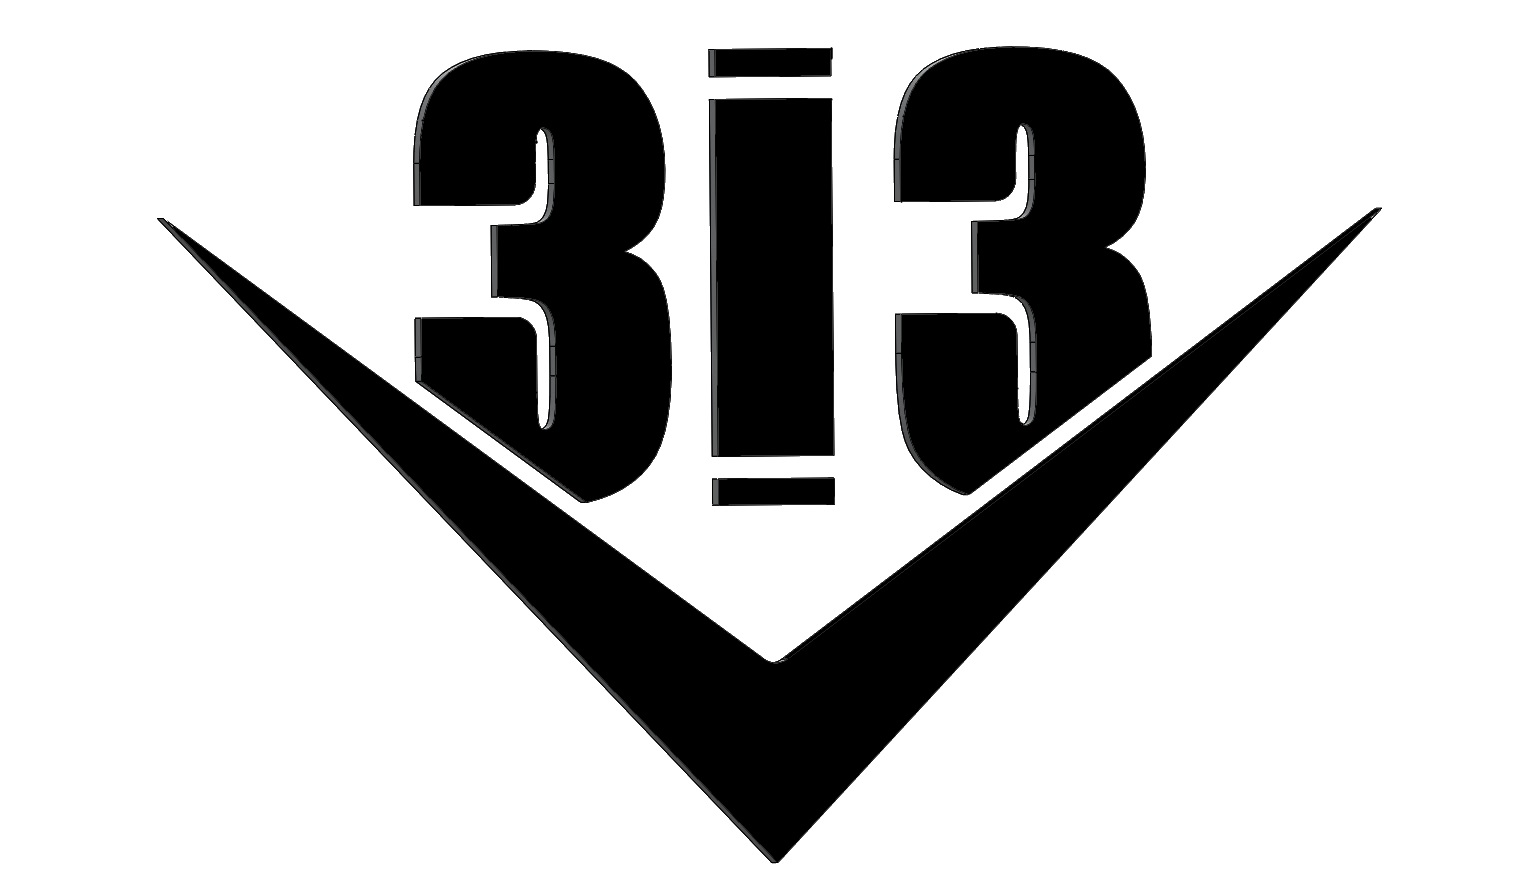 313_black.jpg